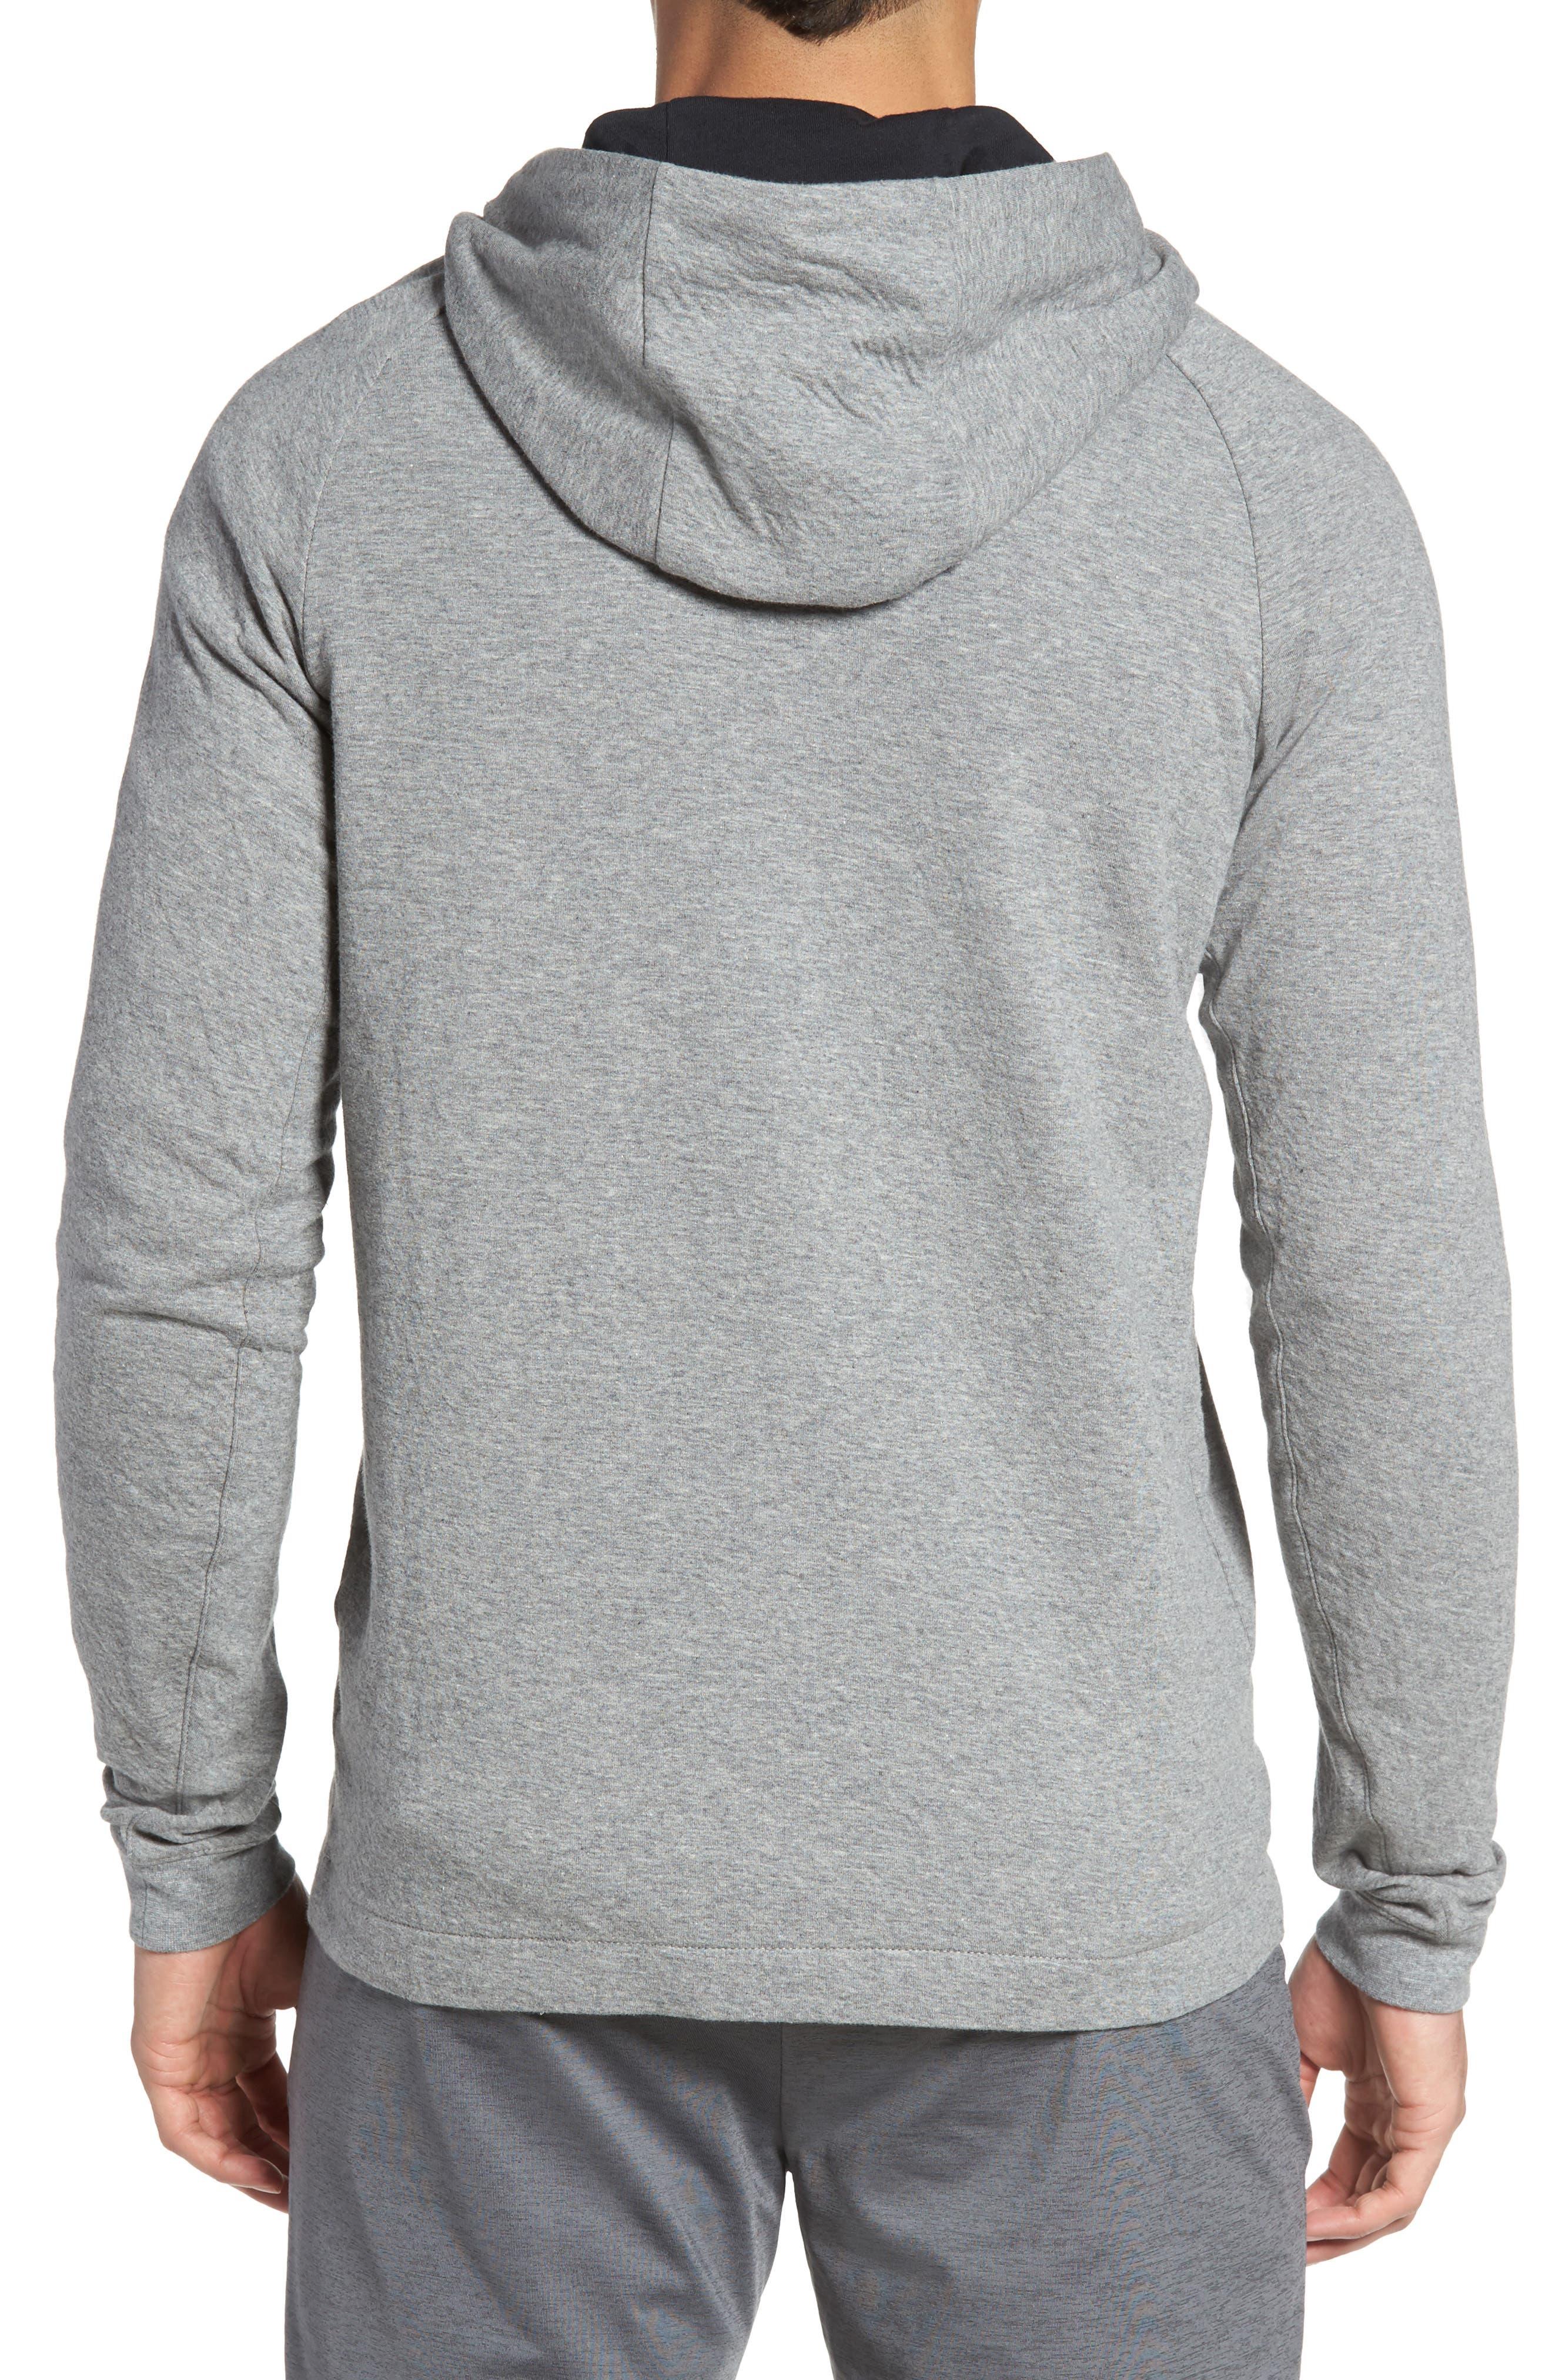 NIKE, Tech Regular Fit Fleece Hoodie, Alternate thumbnail 2, color, CARBON HEATHER/BLACK